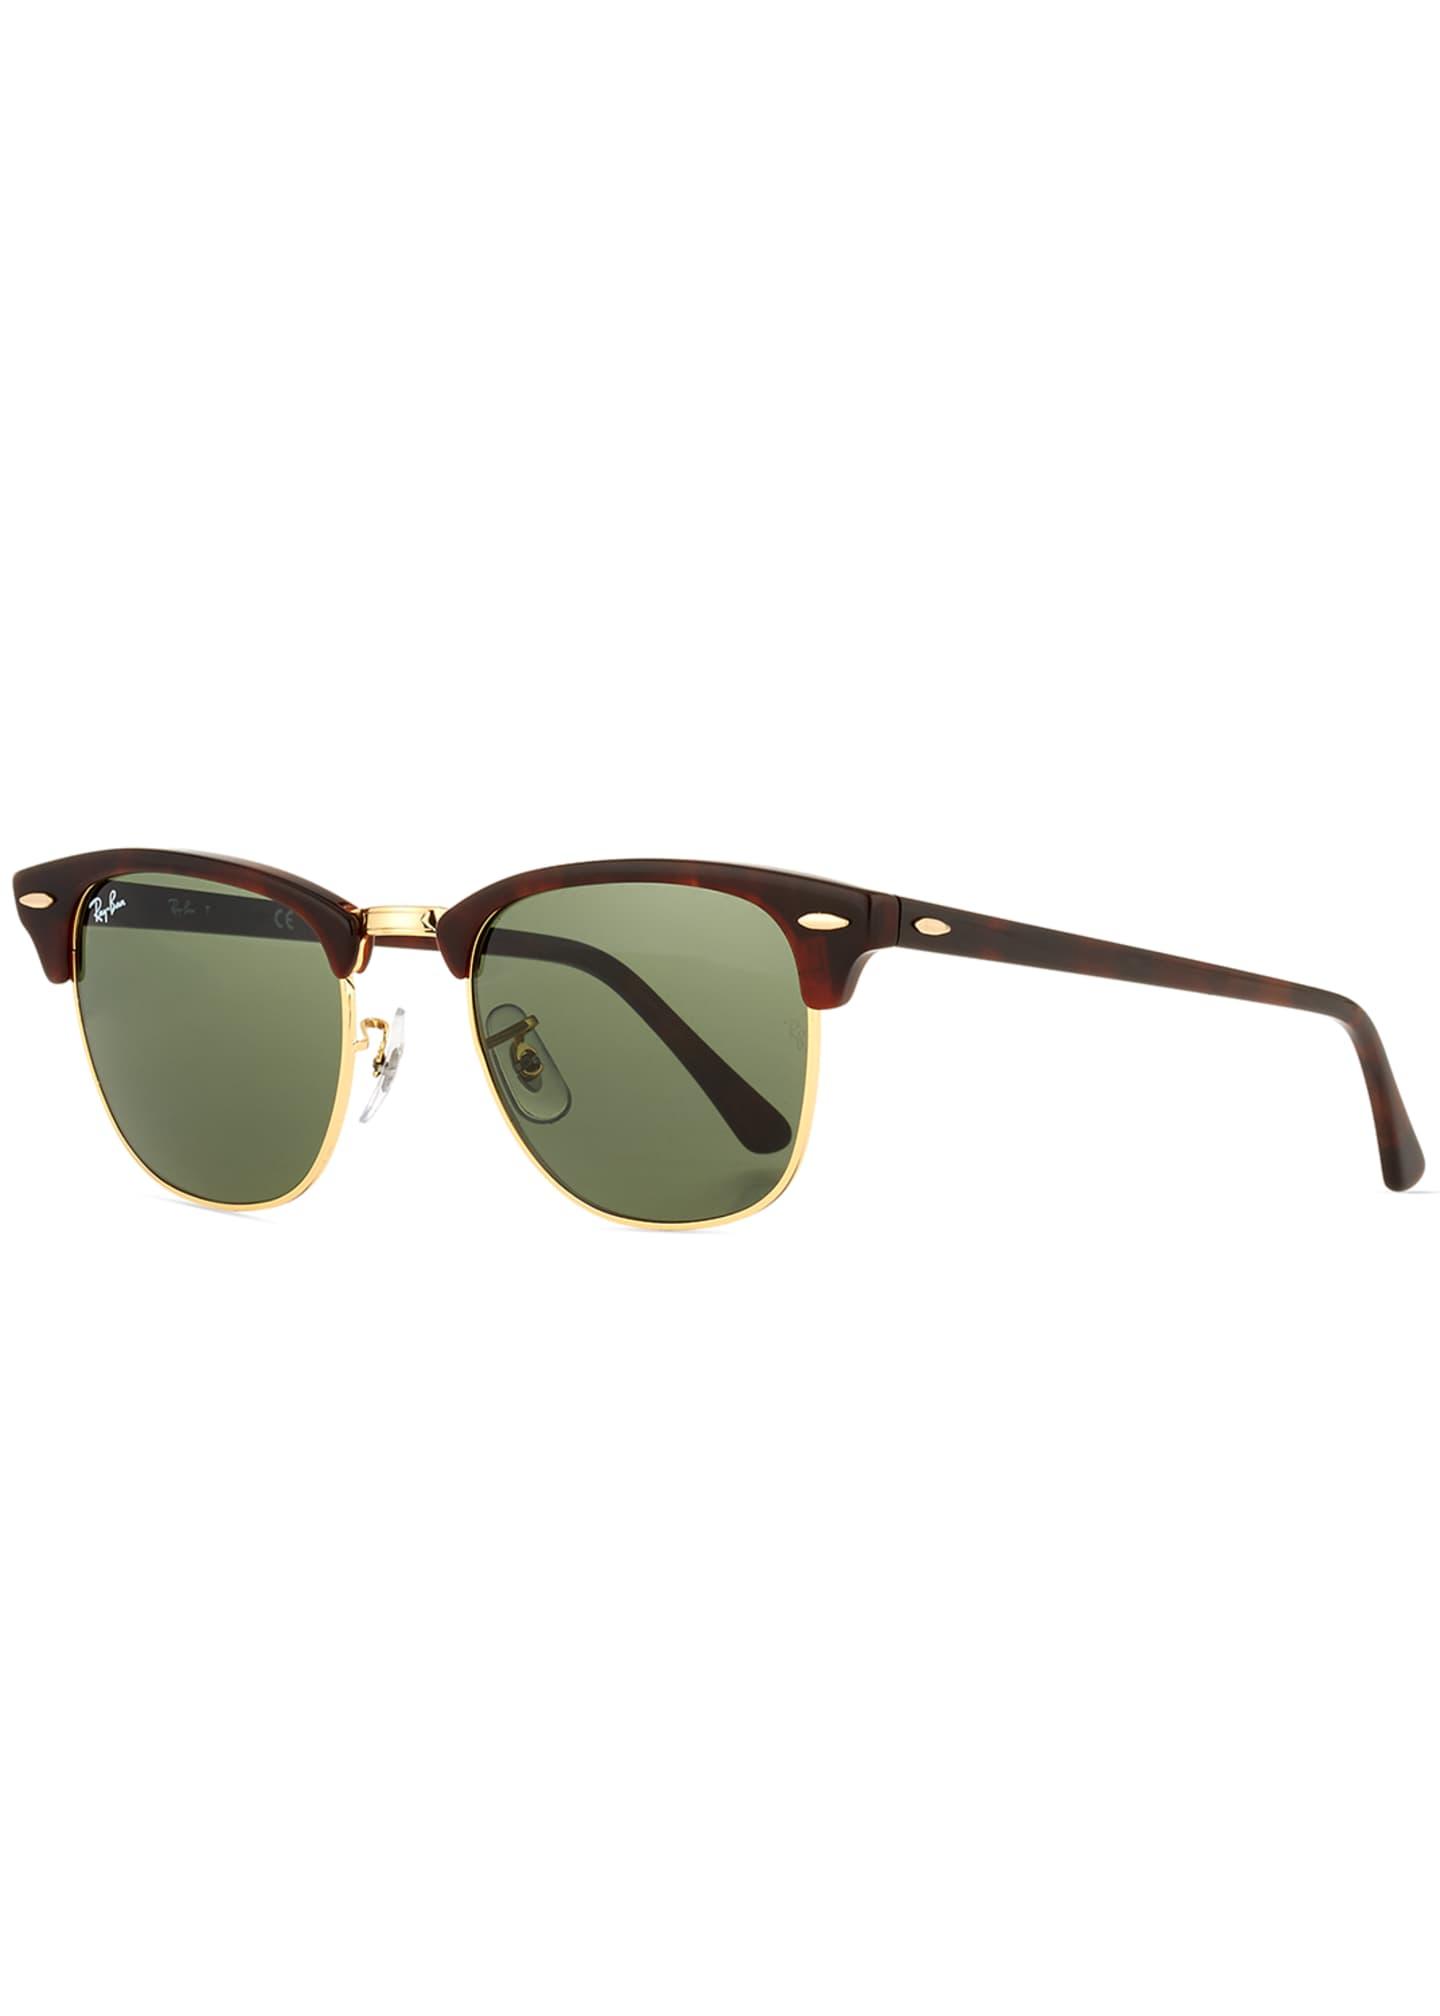 Ray-Ban Clubmaster® Monochromatic Sunglasses